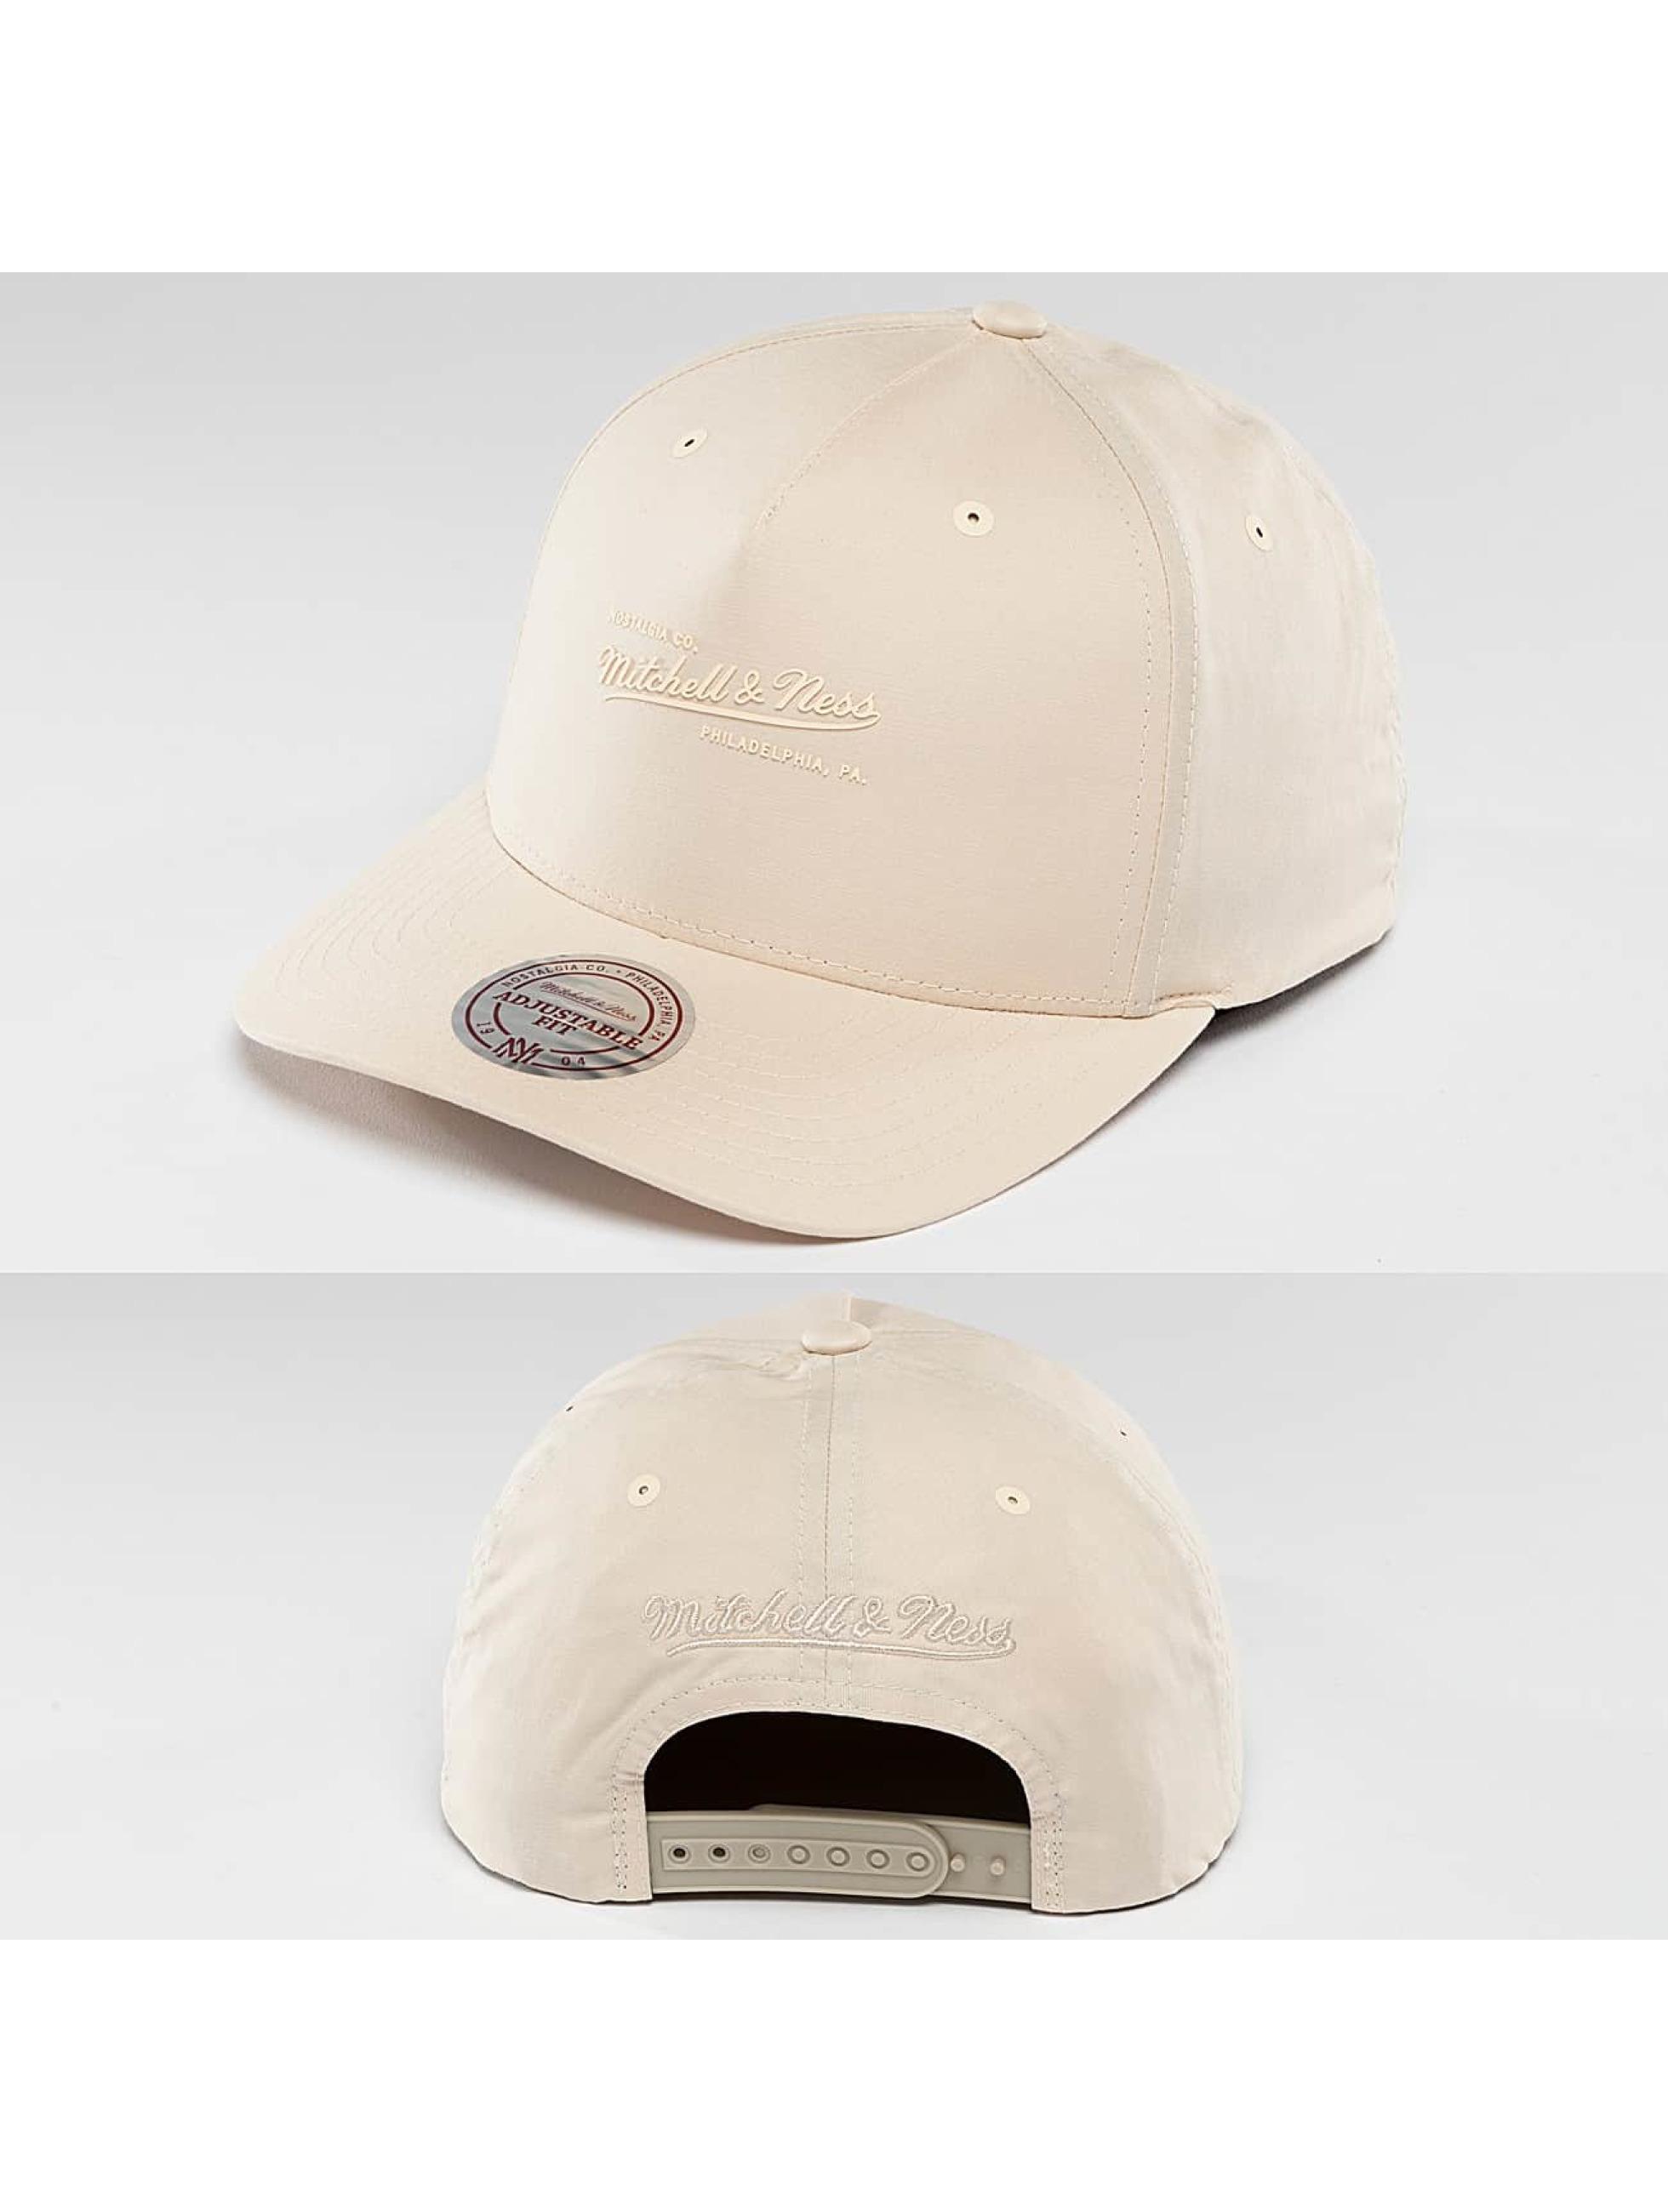 Mitchell & Ness Tactical Snapback Cap Khaki Sale Angebote Gablenz